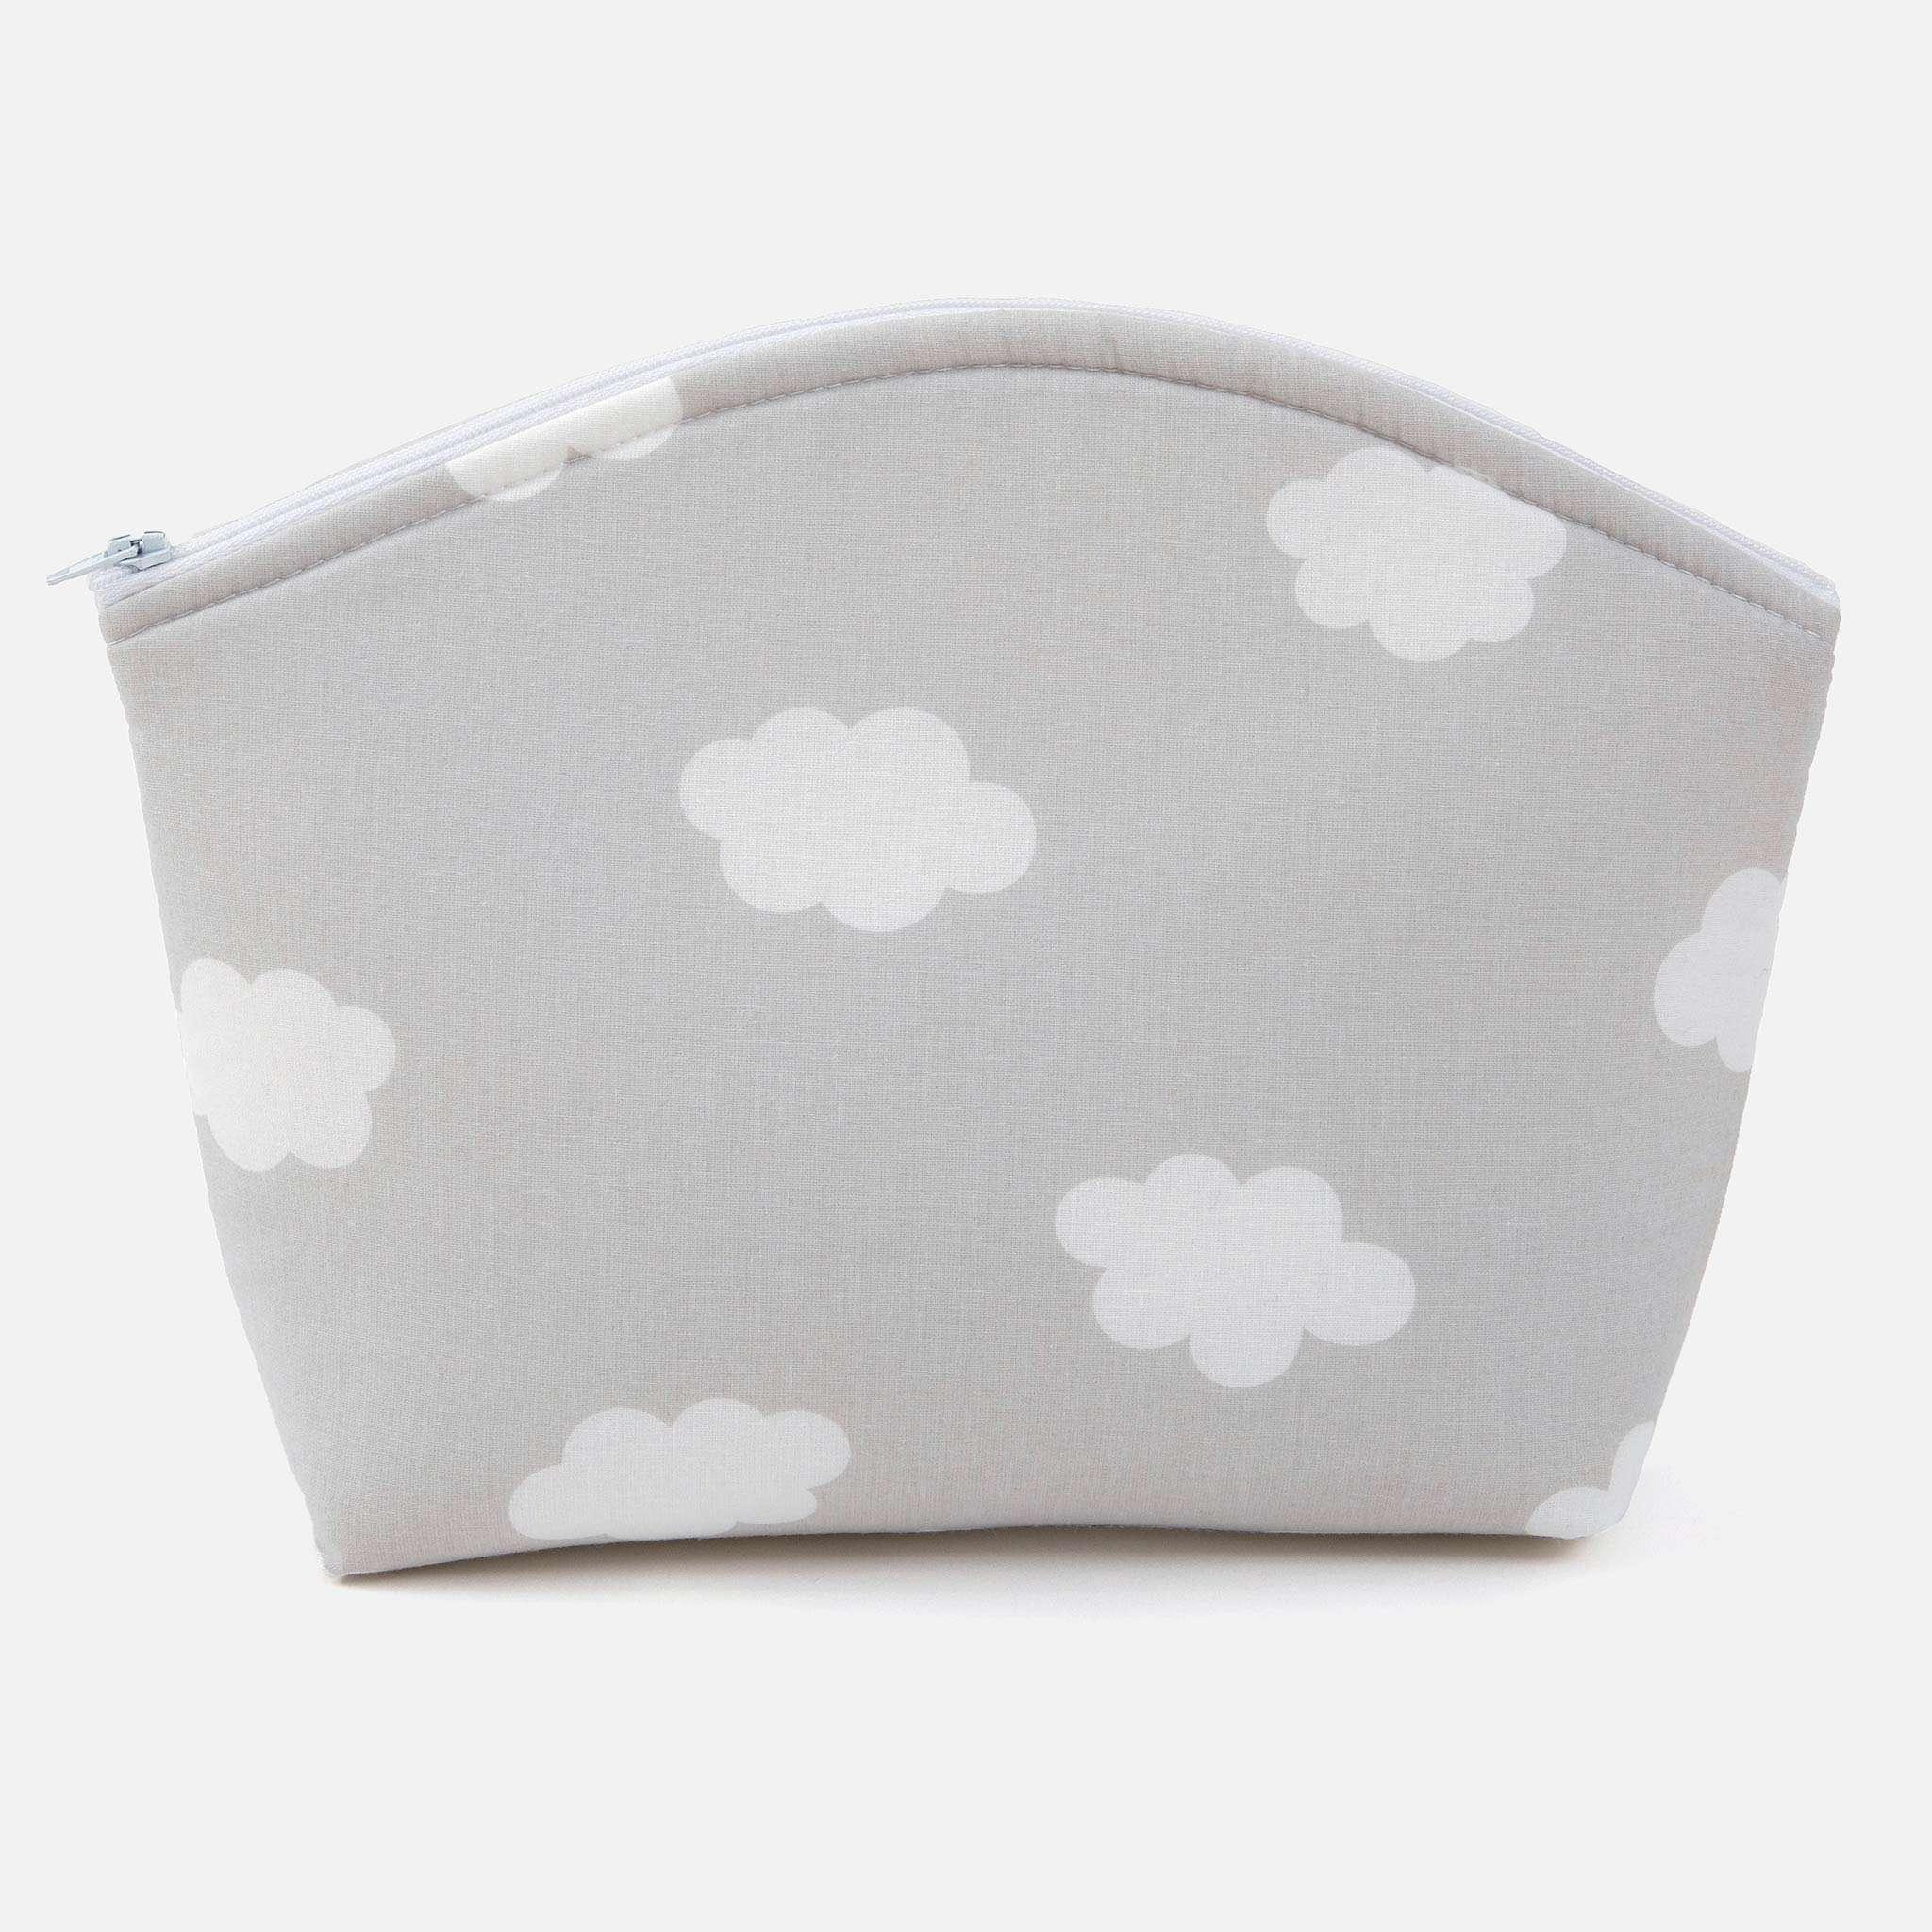 Clouds toilettilaukku, 30x20 cm